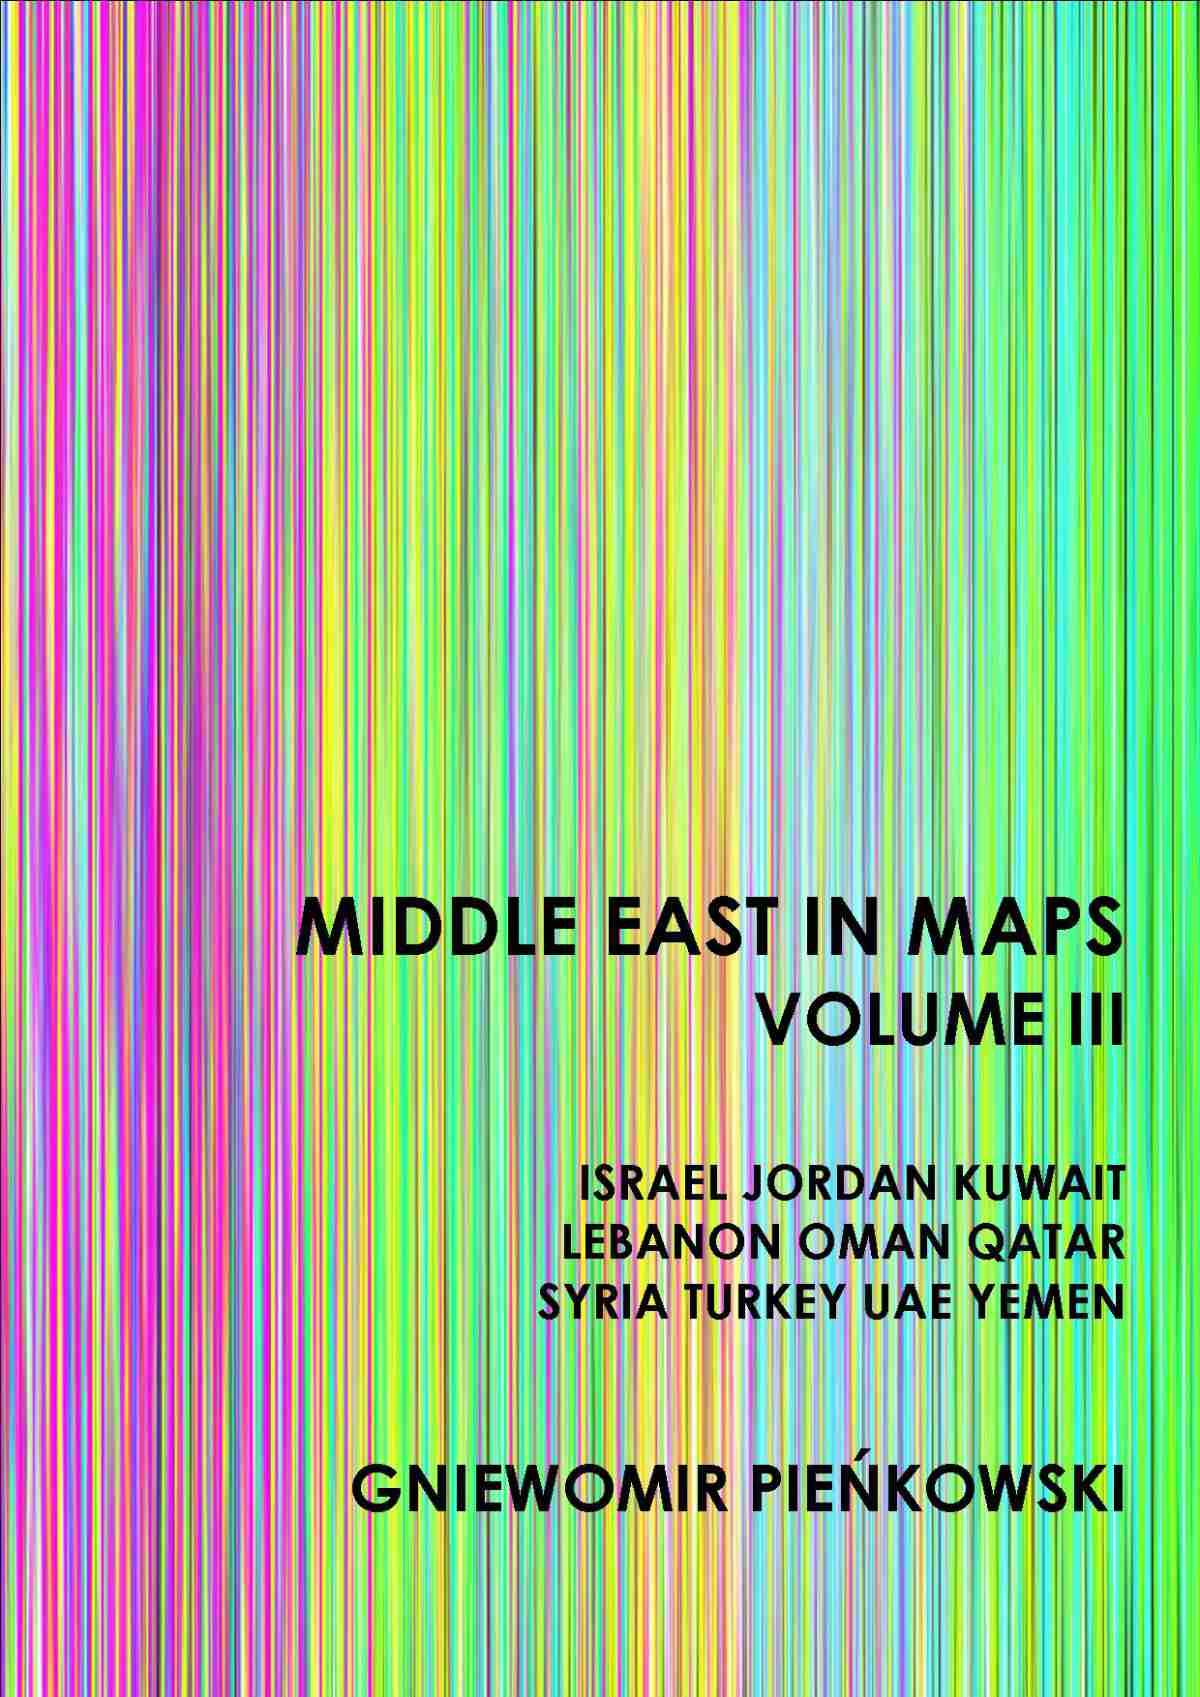 Middle East in Maps. Volume III: Israel, Jordan, Kuwait, Lebanon, Oman, Qatar, Syria, Turkey, UAE, Yemen - Ebook (Książka PDF) do pobrania w formacie PDF